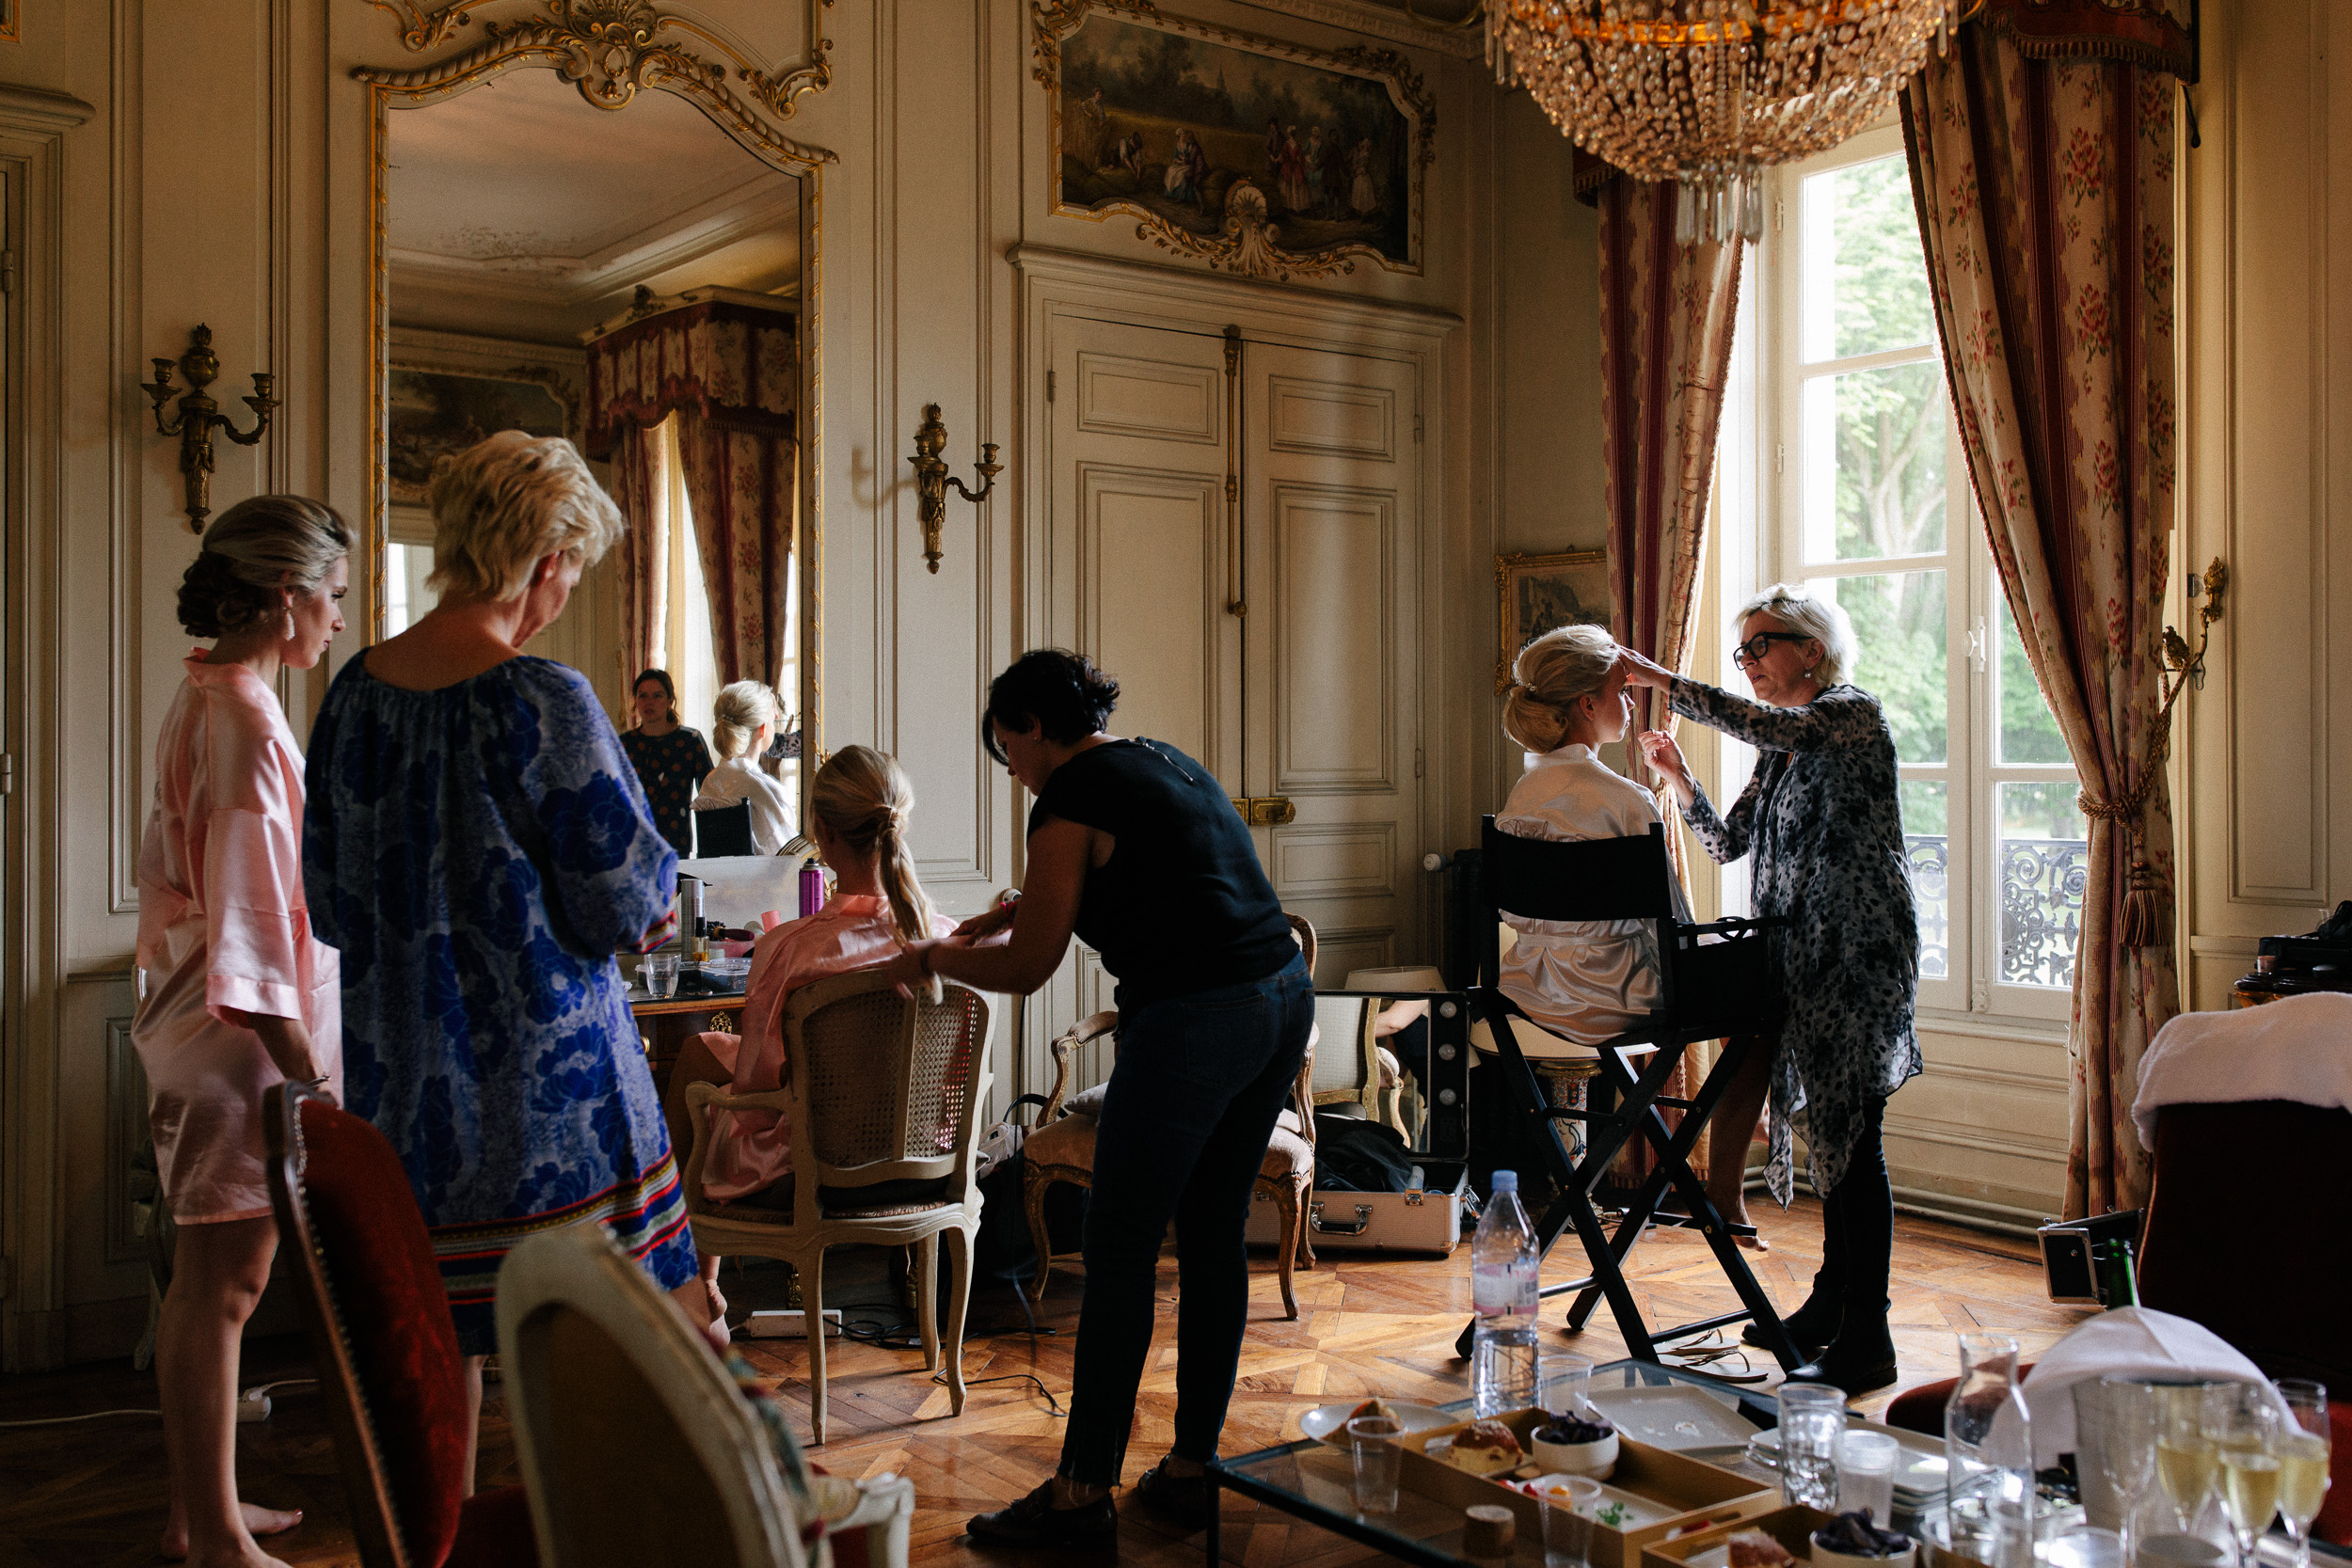 Wedding-Chateau-de-Varennes-014.jpg